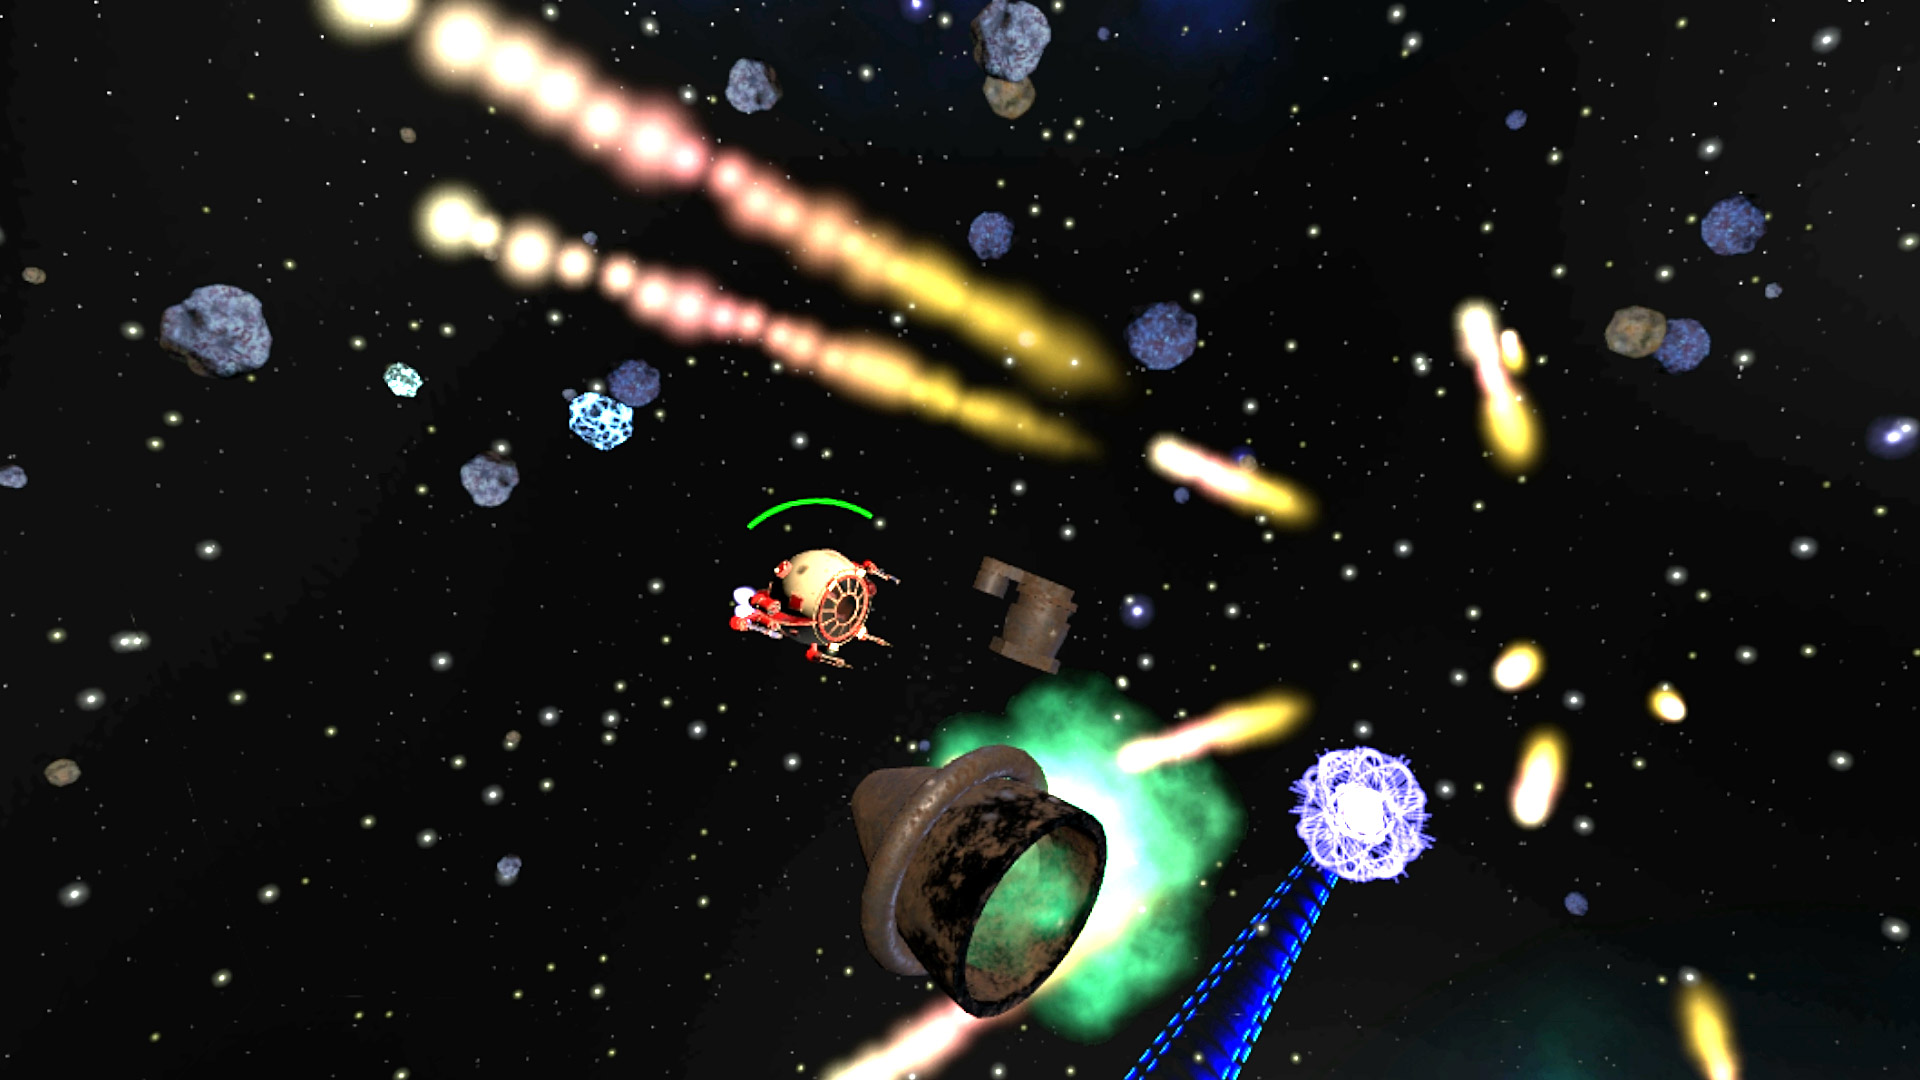 Oculus Quest 游戏《Space Junk》宇宙垃圾插图(3)